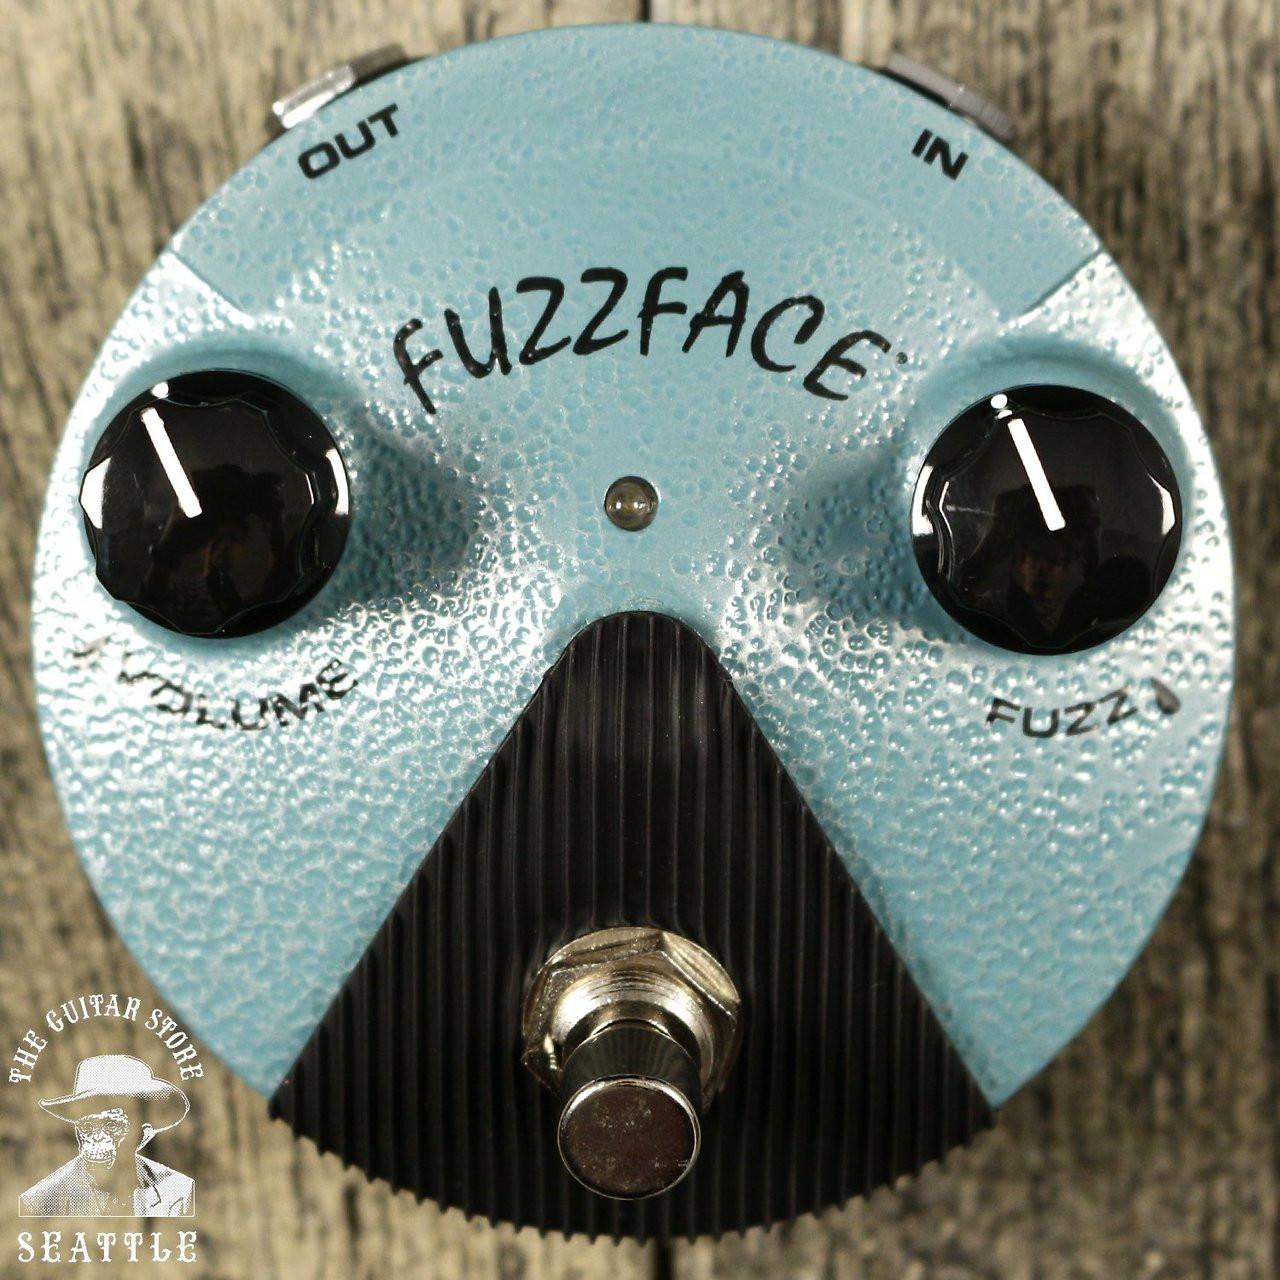 Dunlop Ffm3 Jimi Hendrix Fuzz Face Mini Distortion The Guitar Store Jimmy Effect Schematic Diagram